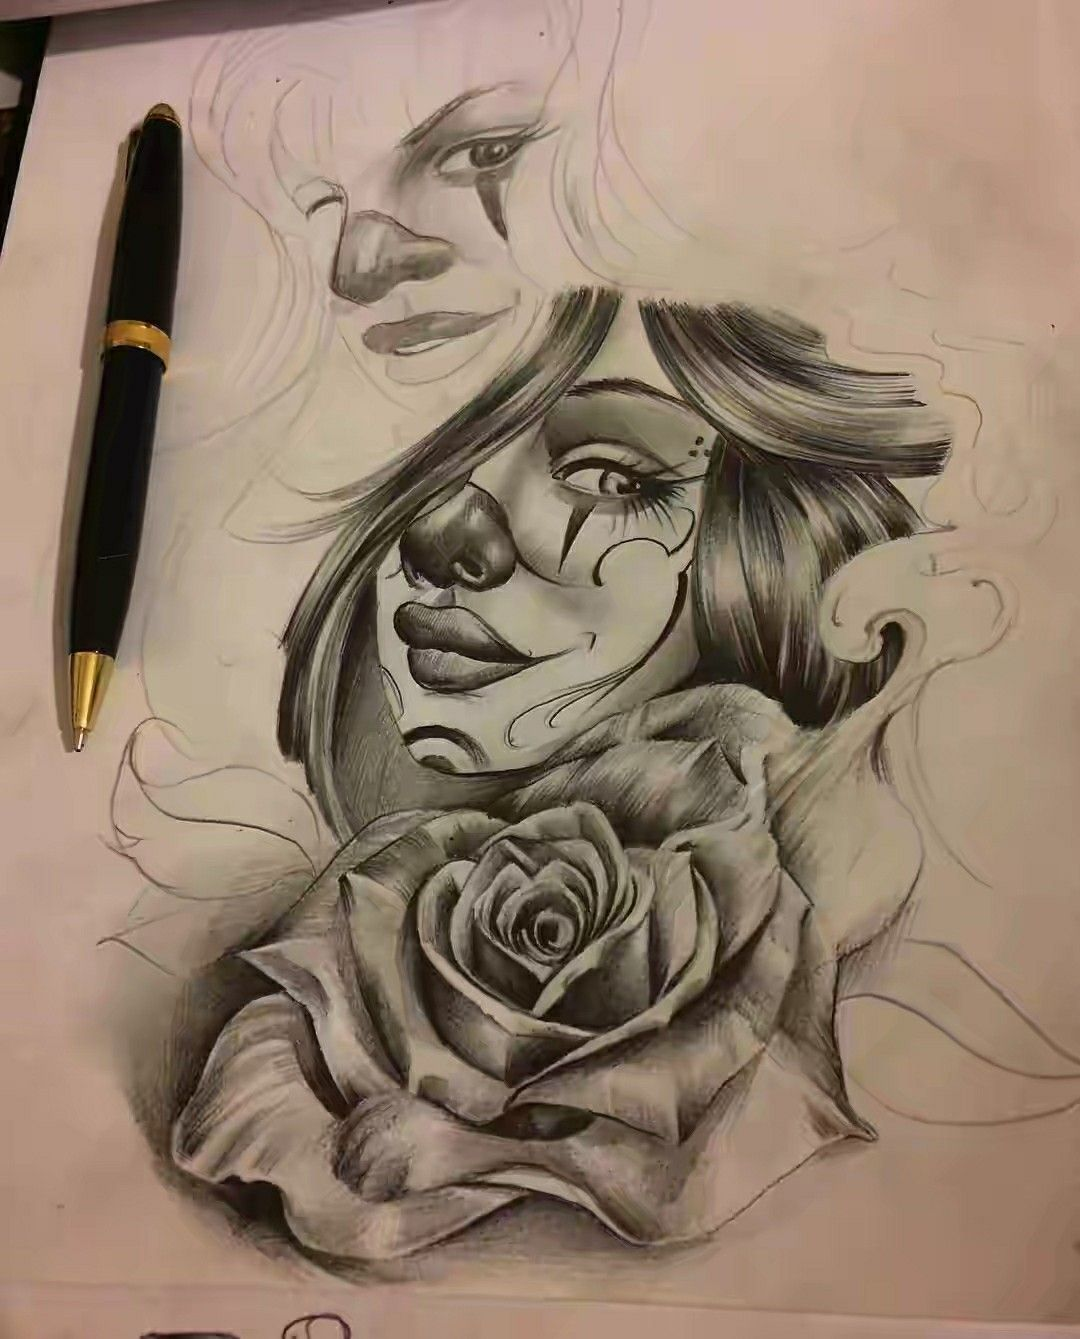 Pin Mrsilentphxaz Drawings Zeichnungen Tattoo Ideen And Malen